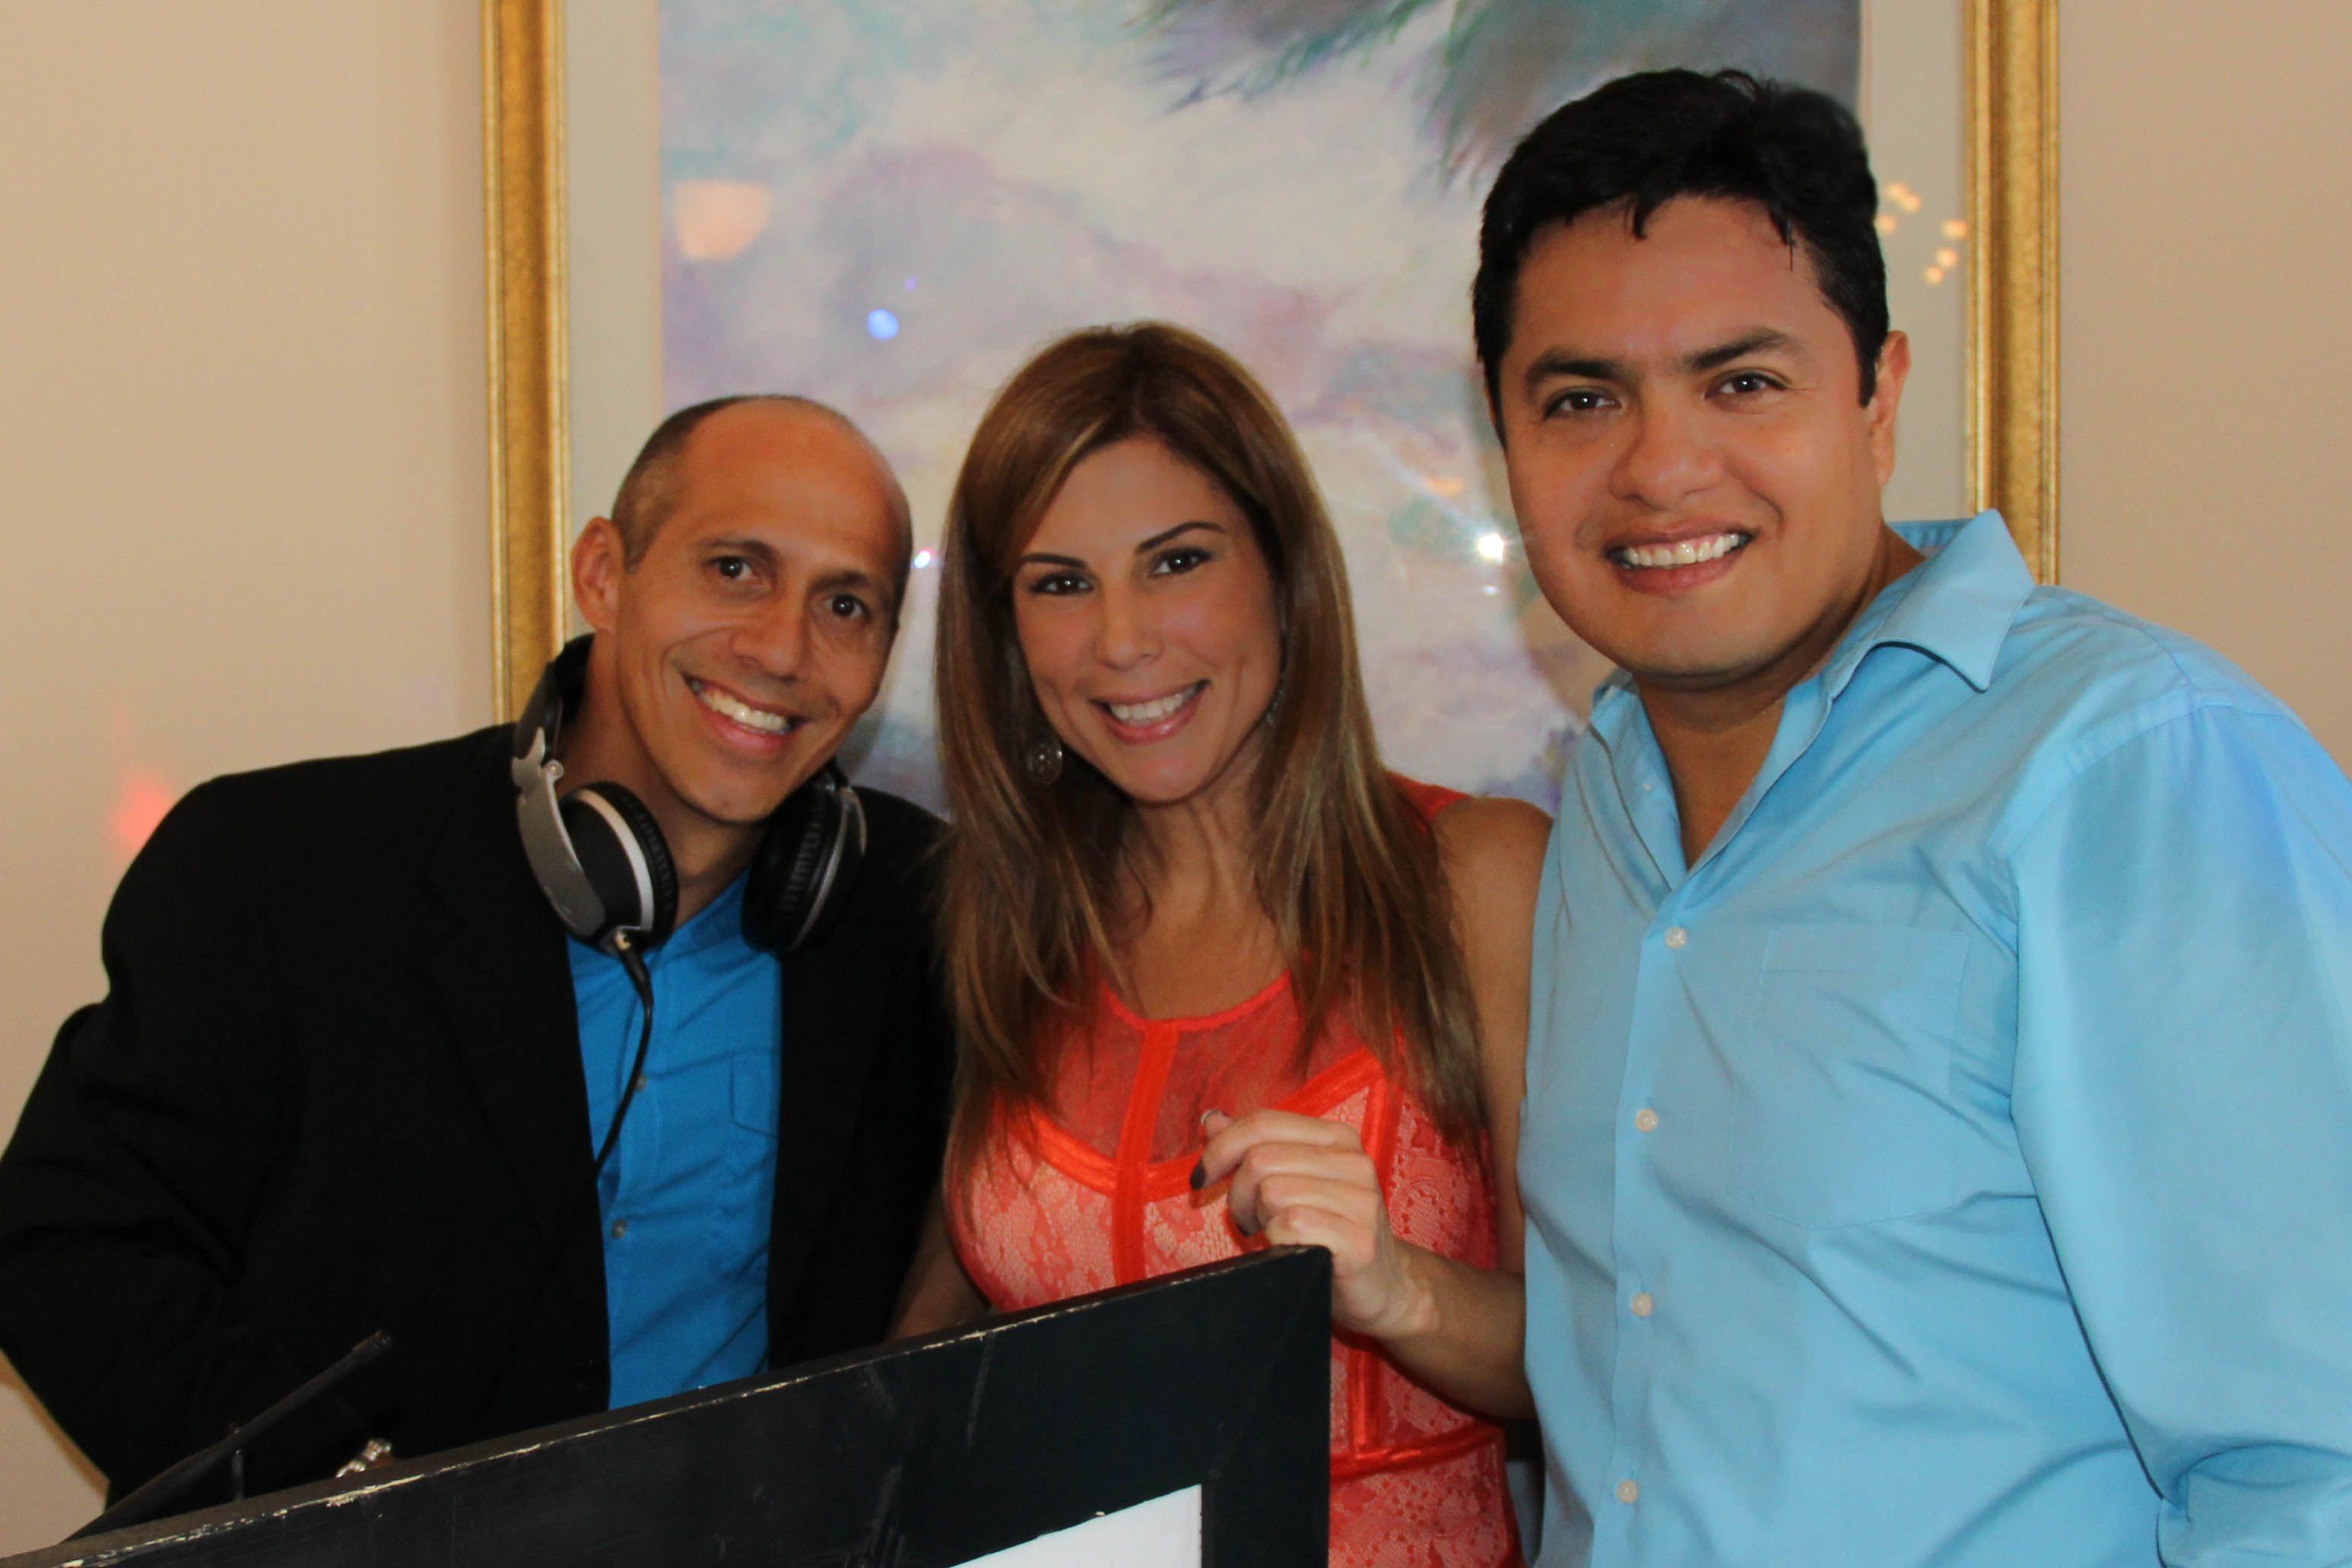 DJ Jorge and Photographer Cesar Nunez.  Photographer donated his work to the school's Autism department.